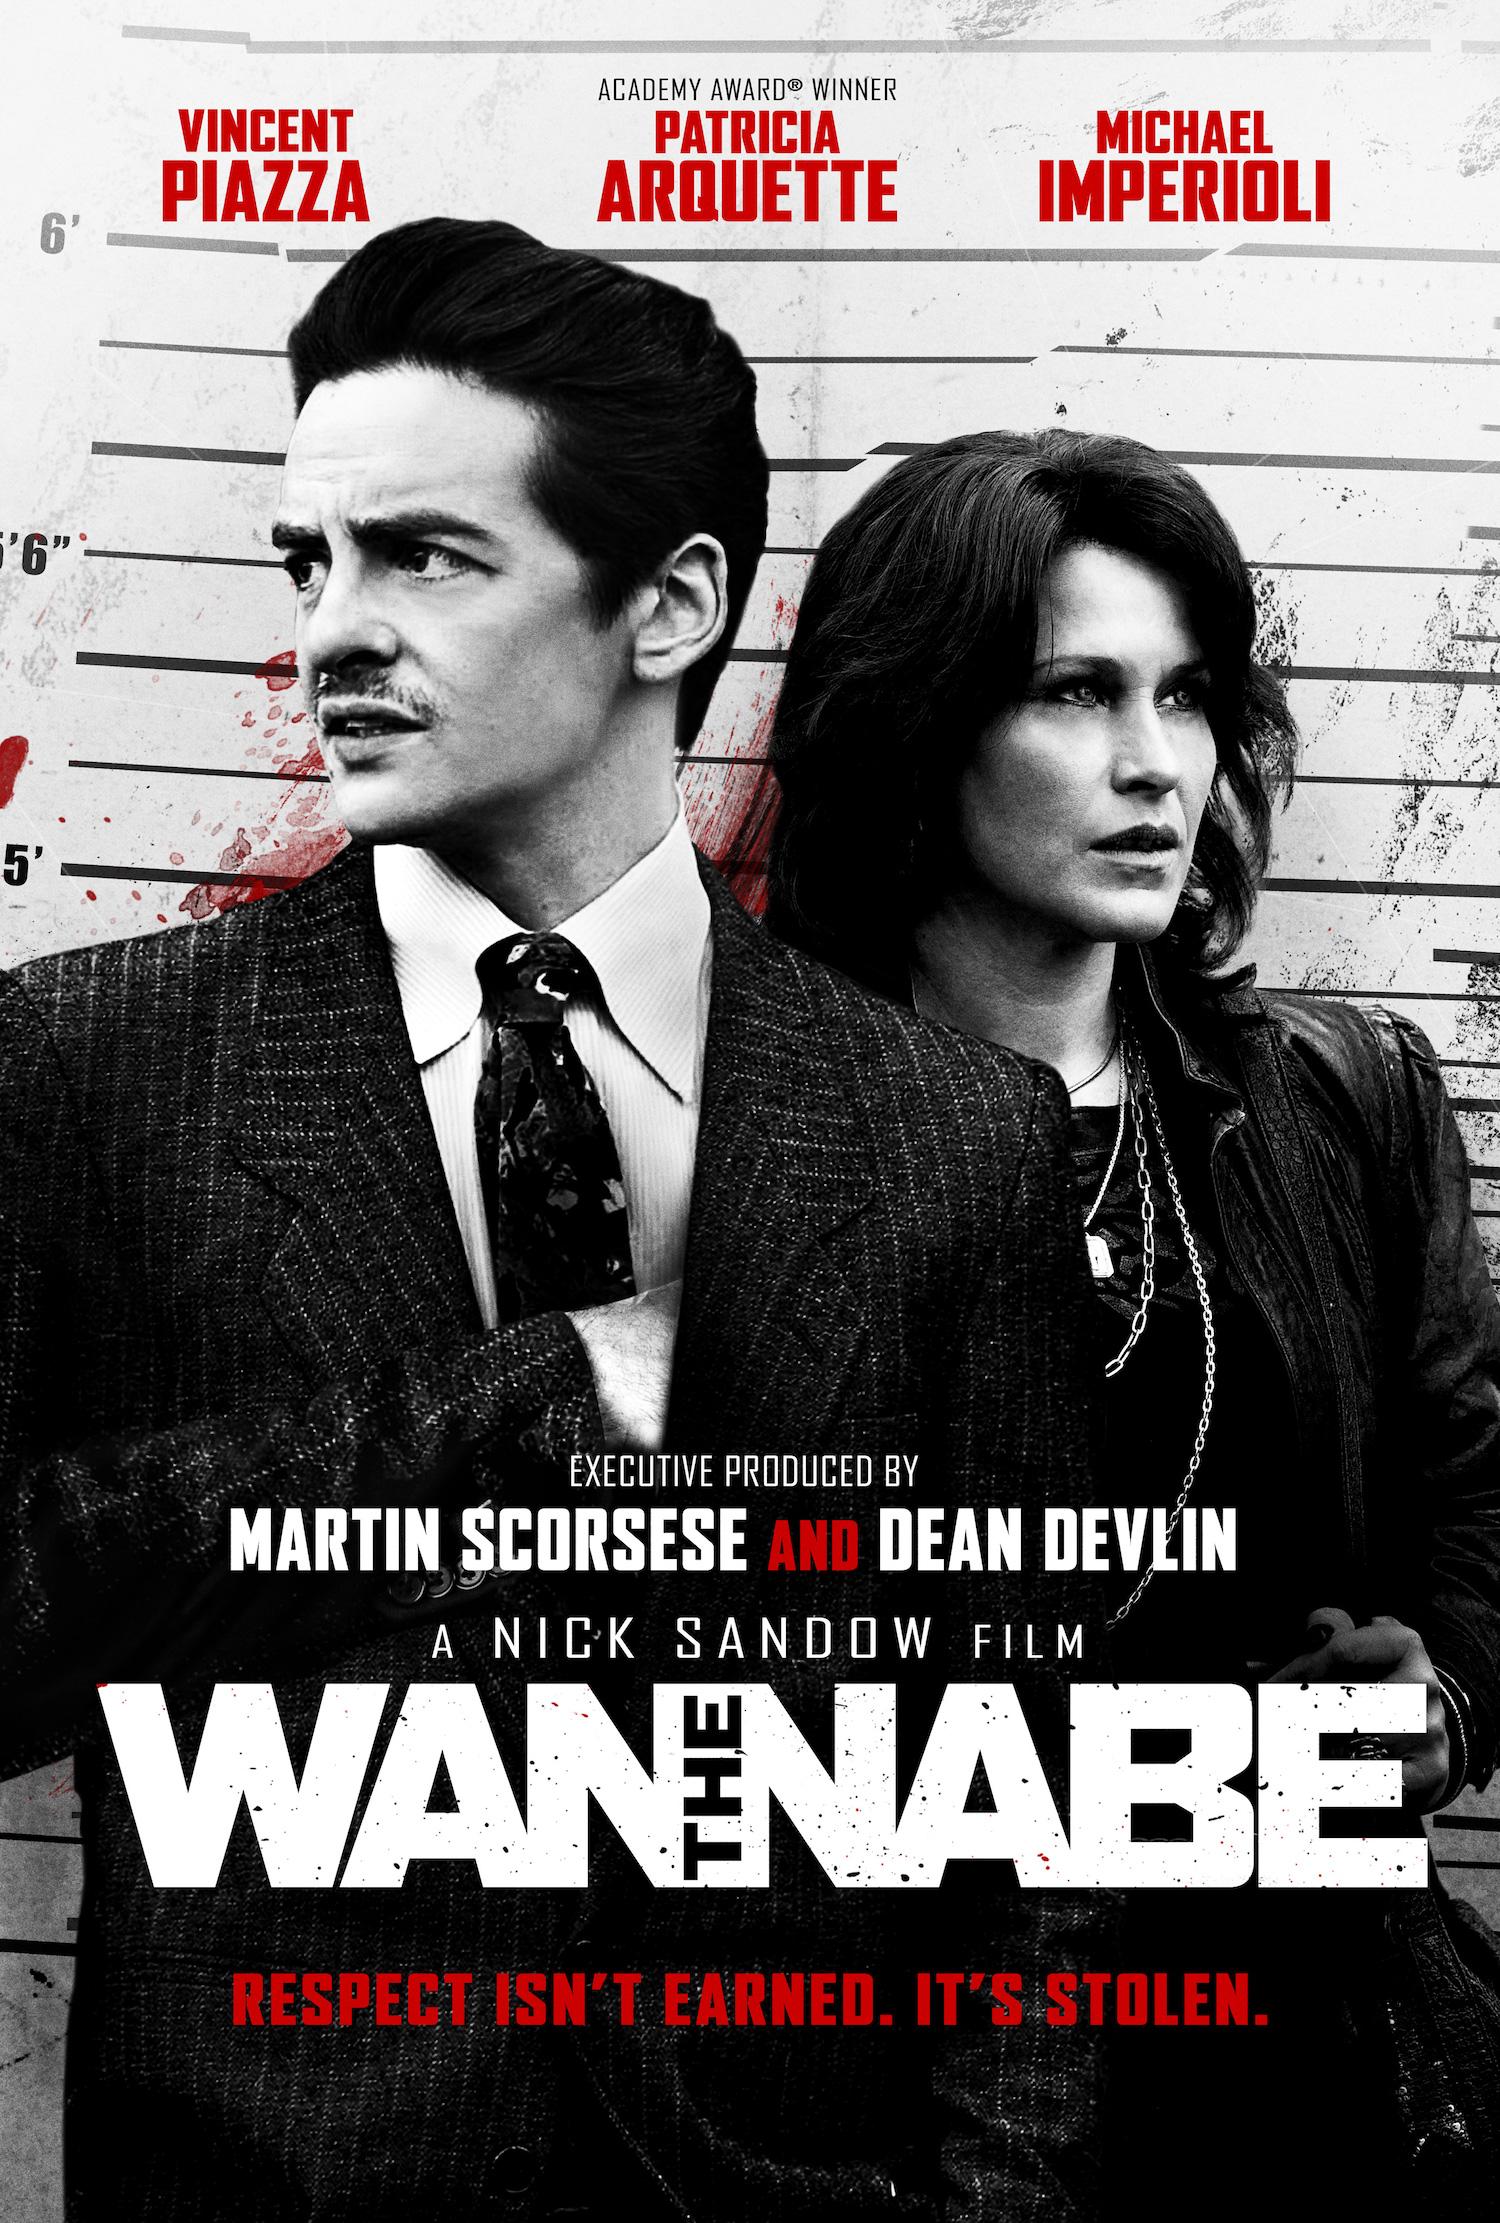 دانلود فیلم جنون The Wannabe - دانلود فیلم جنون The Wannabe دوبله فارسی